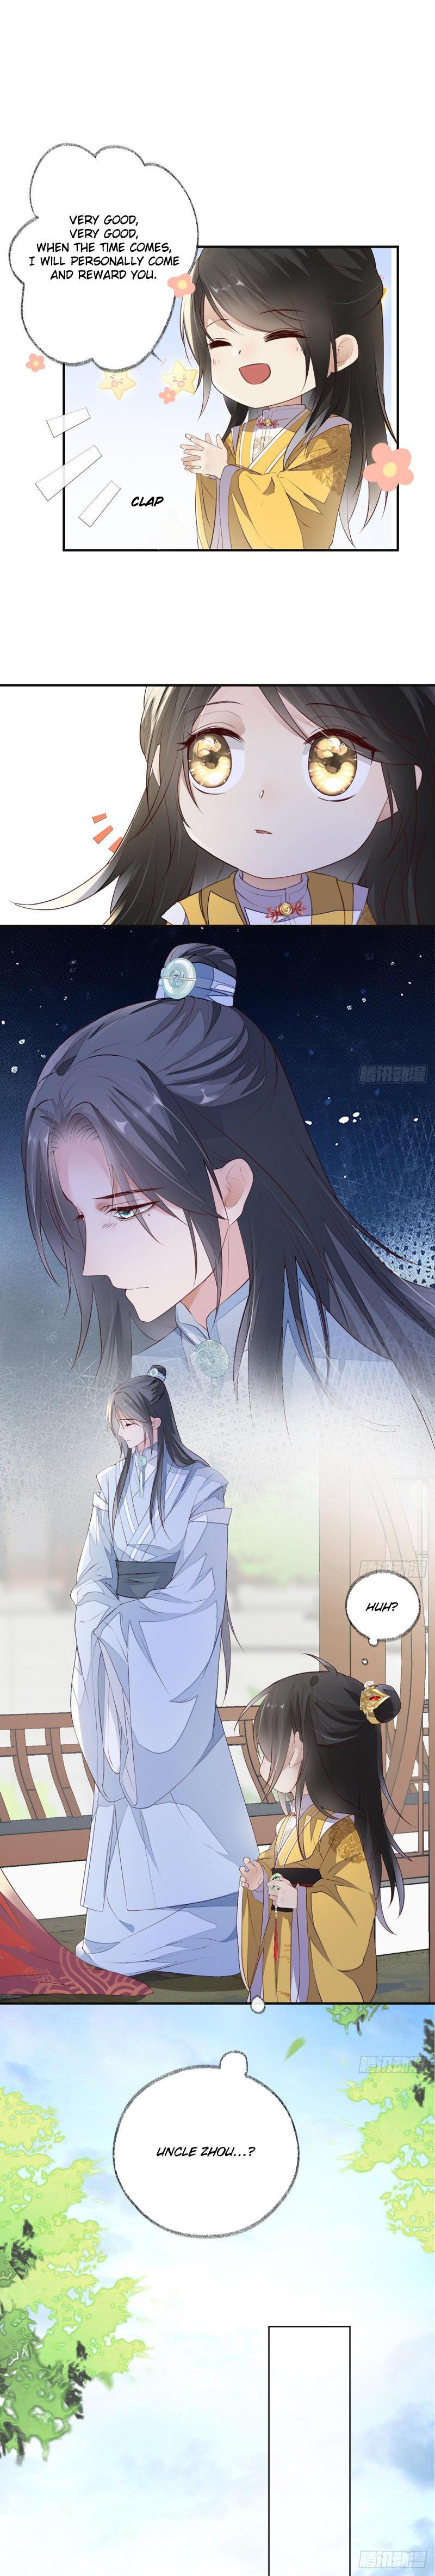 Empress Mother Chapter 8 page 4 - Mangakakalots.com